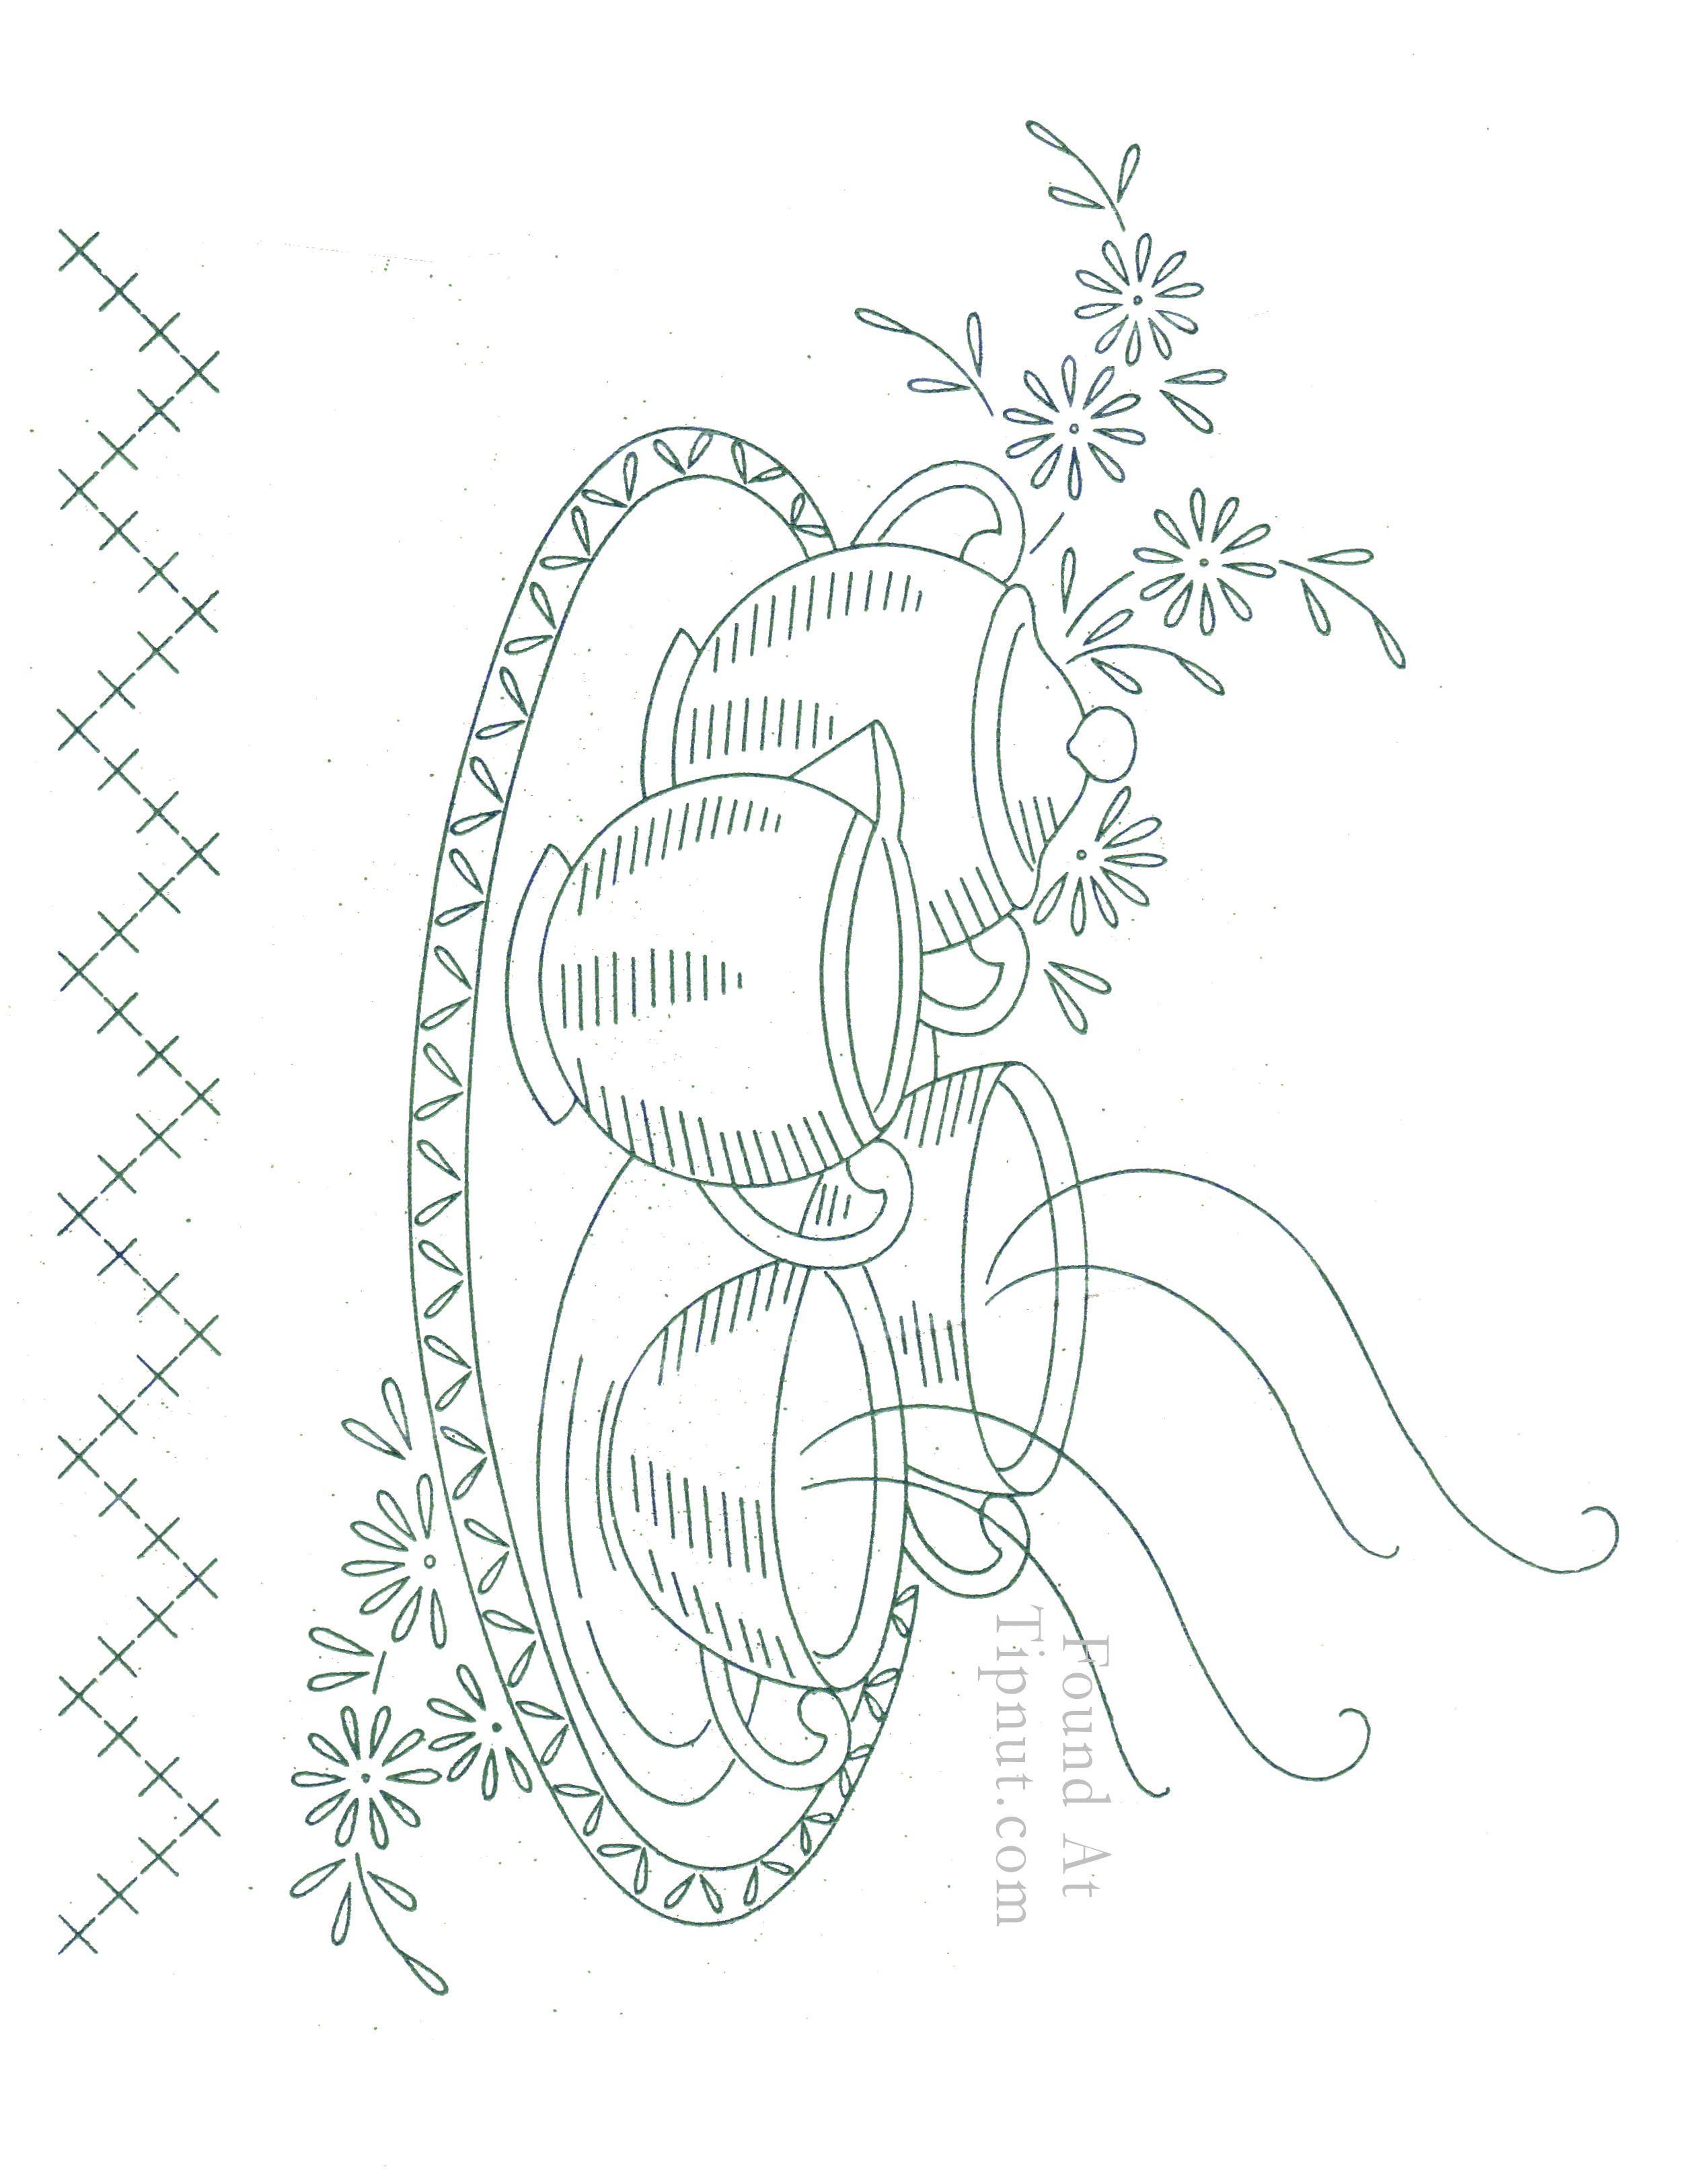 Vintage Embroidery Patterns | Vintage Embroidery Designs: Dishware ...